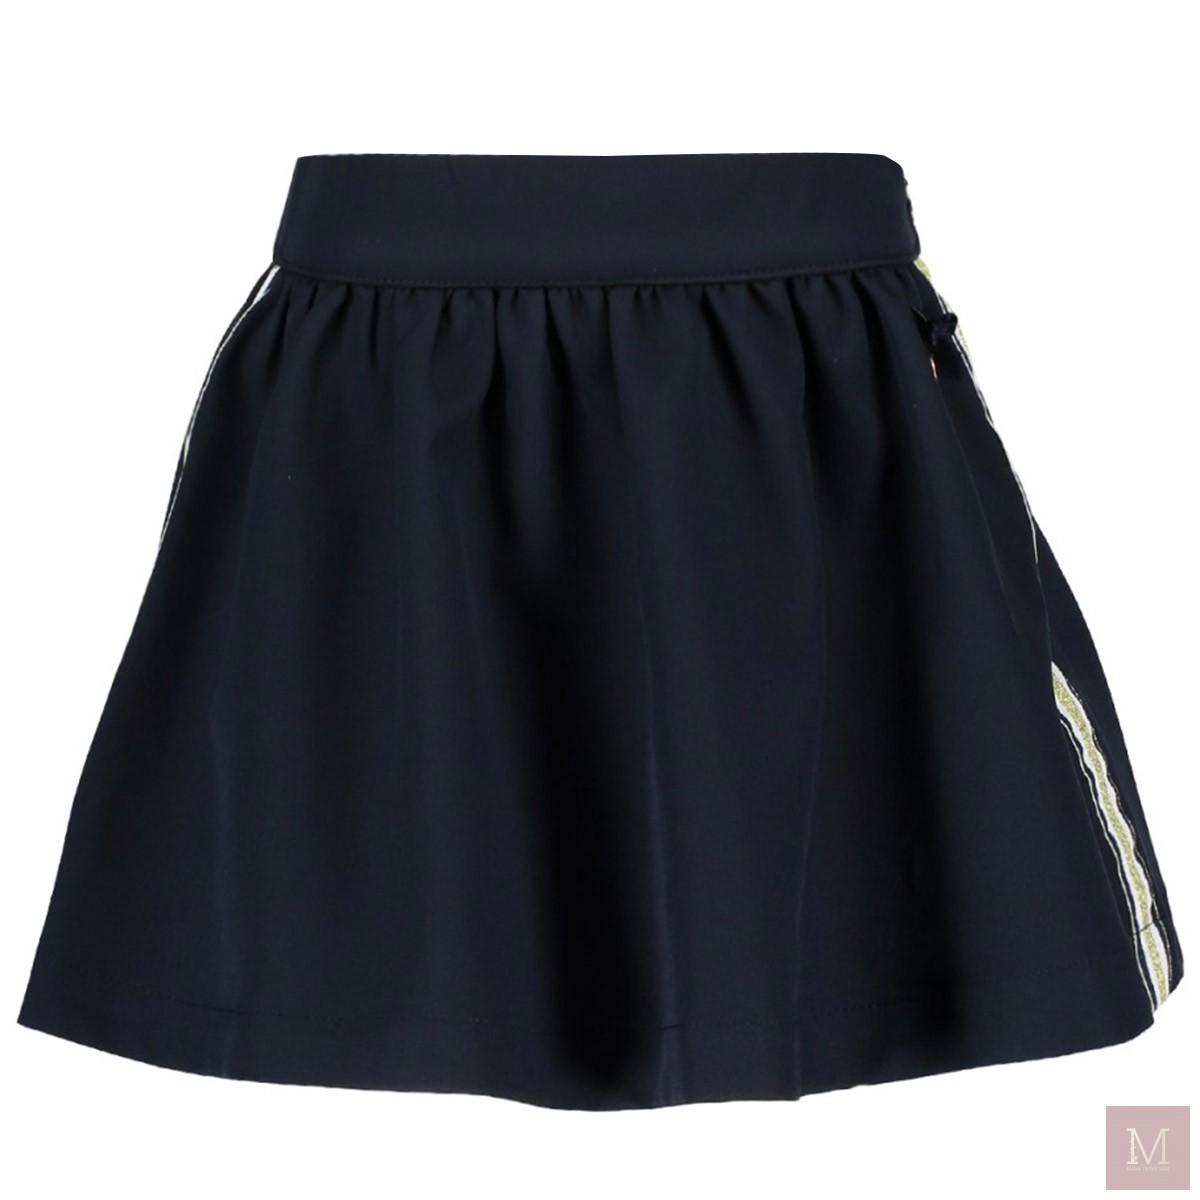 zomerrokje le chic, kleertjes.com, favoriete merken